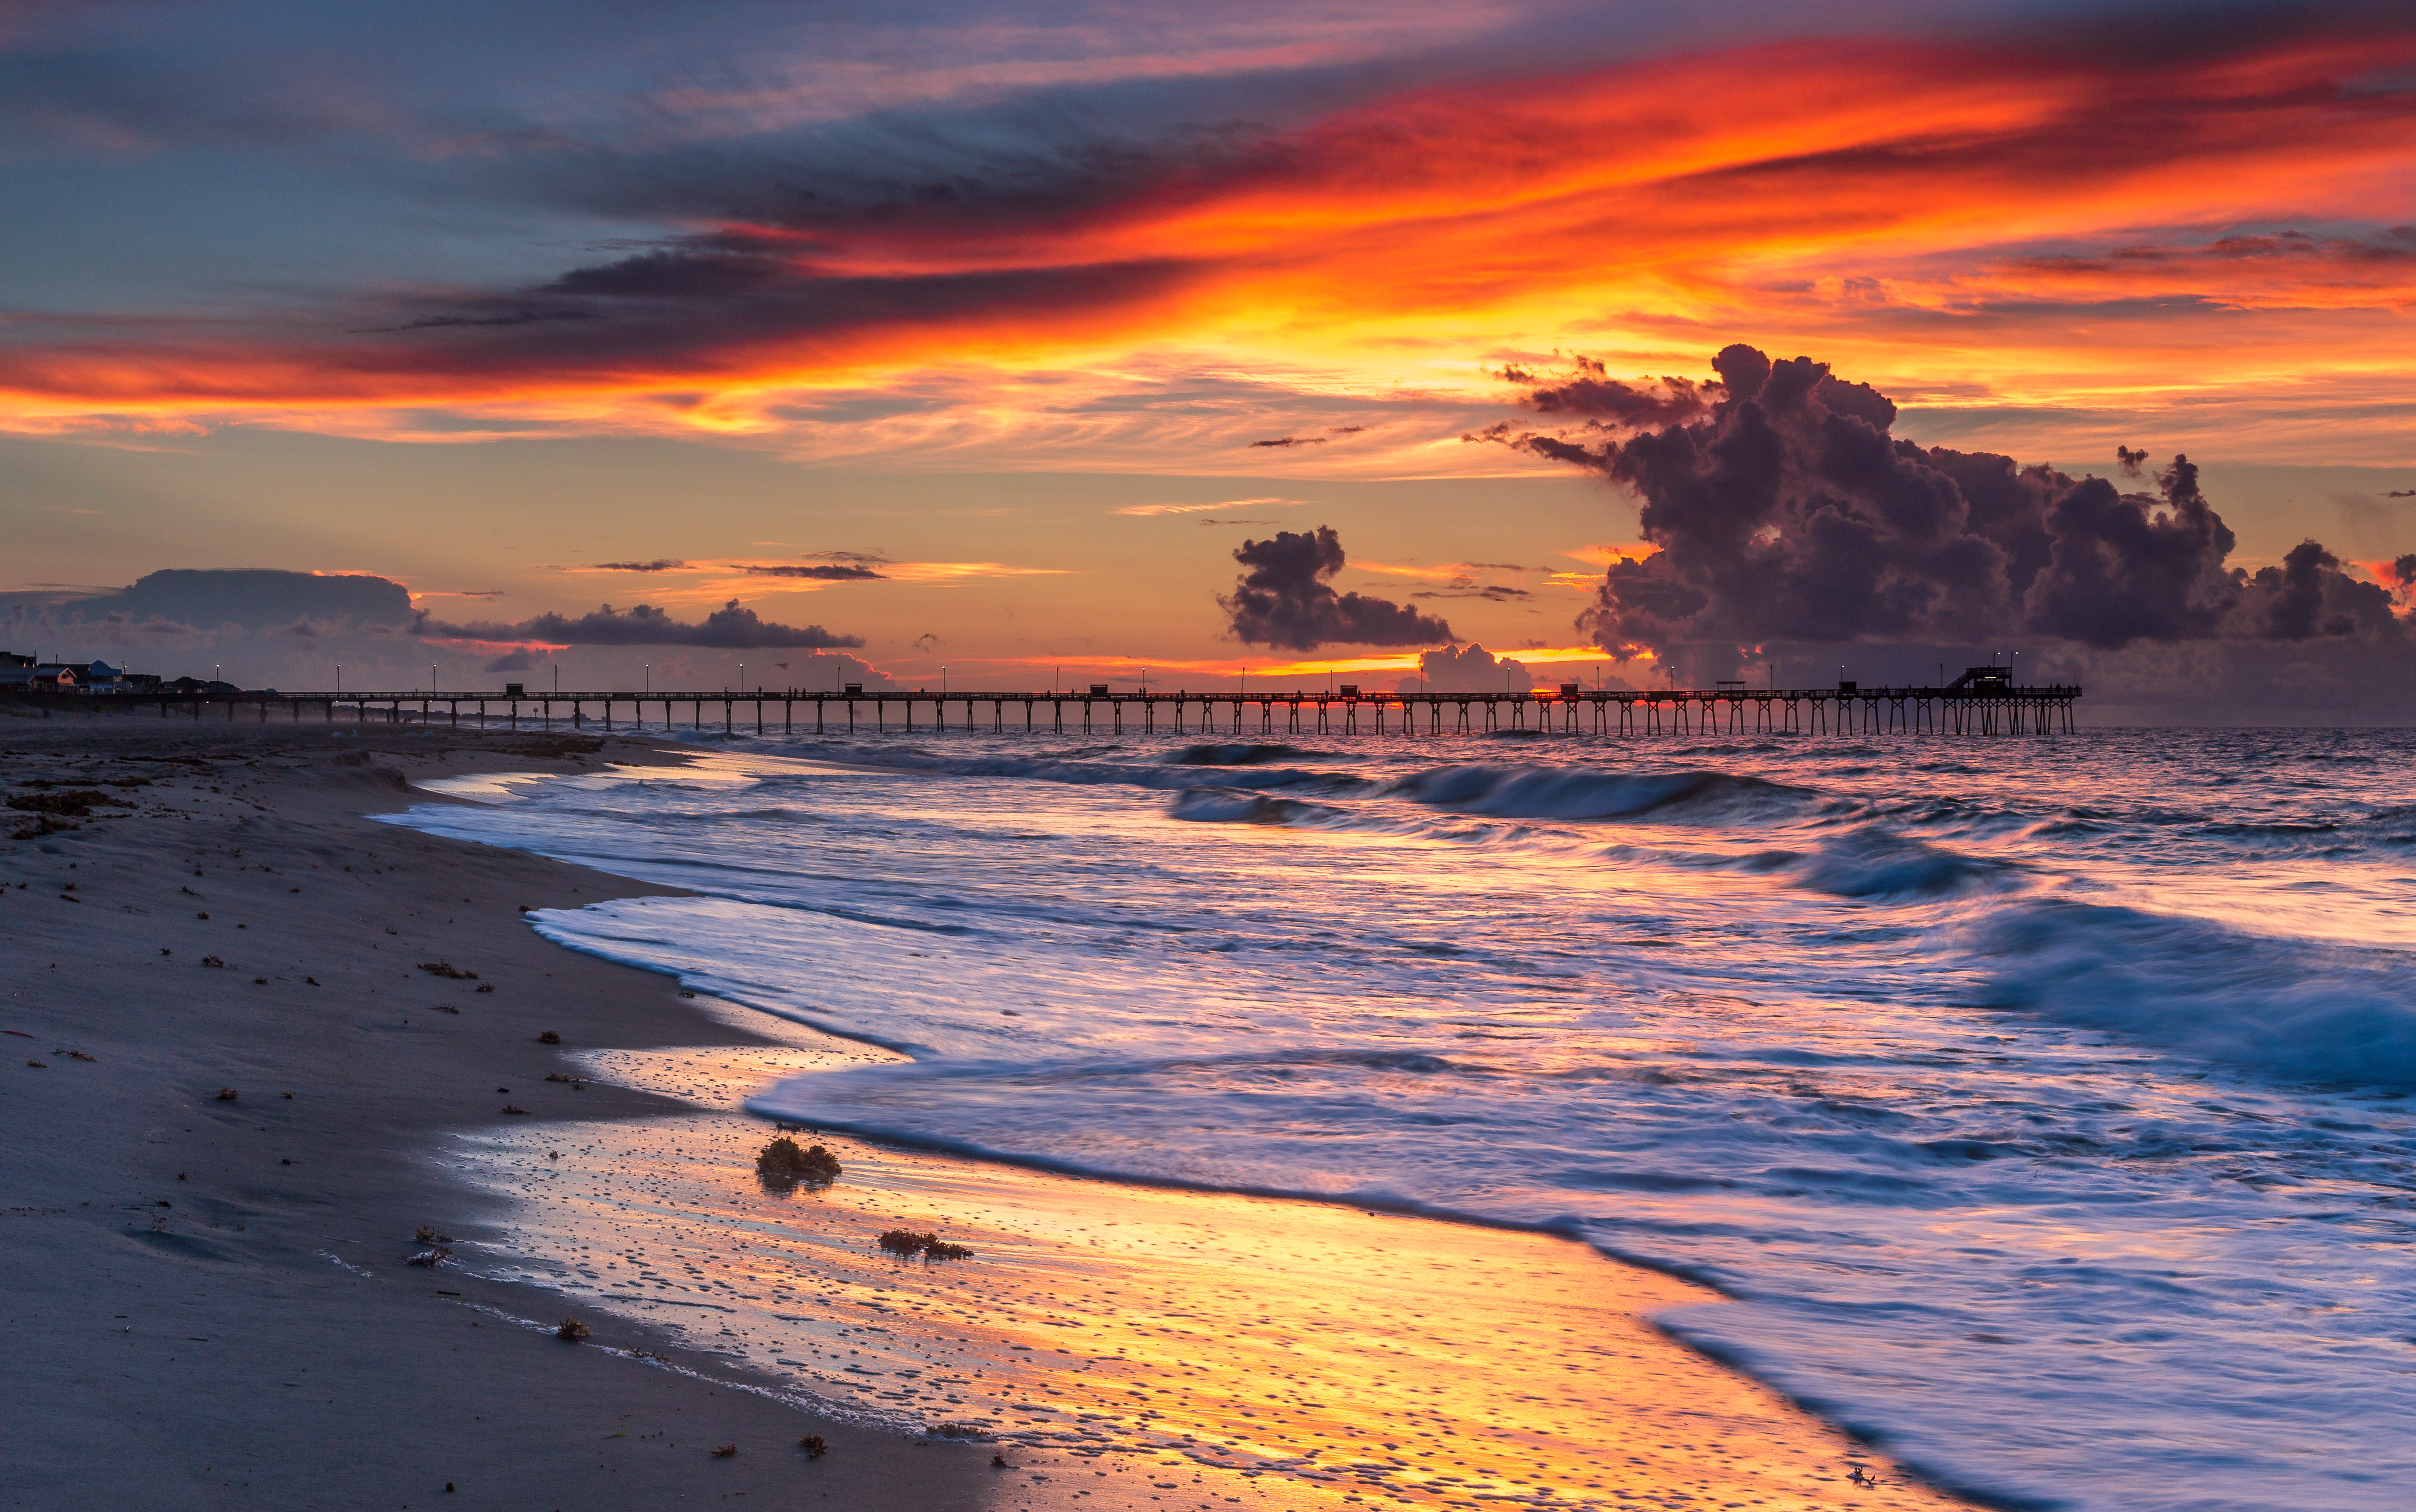 Pier at Sunrise on Emerald Isle